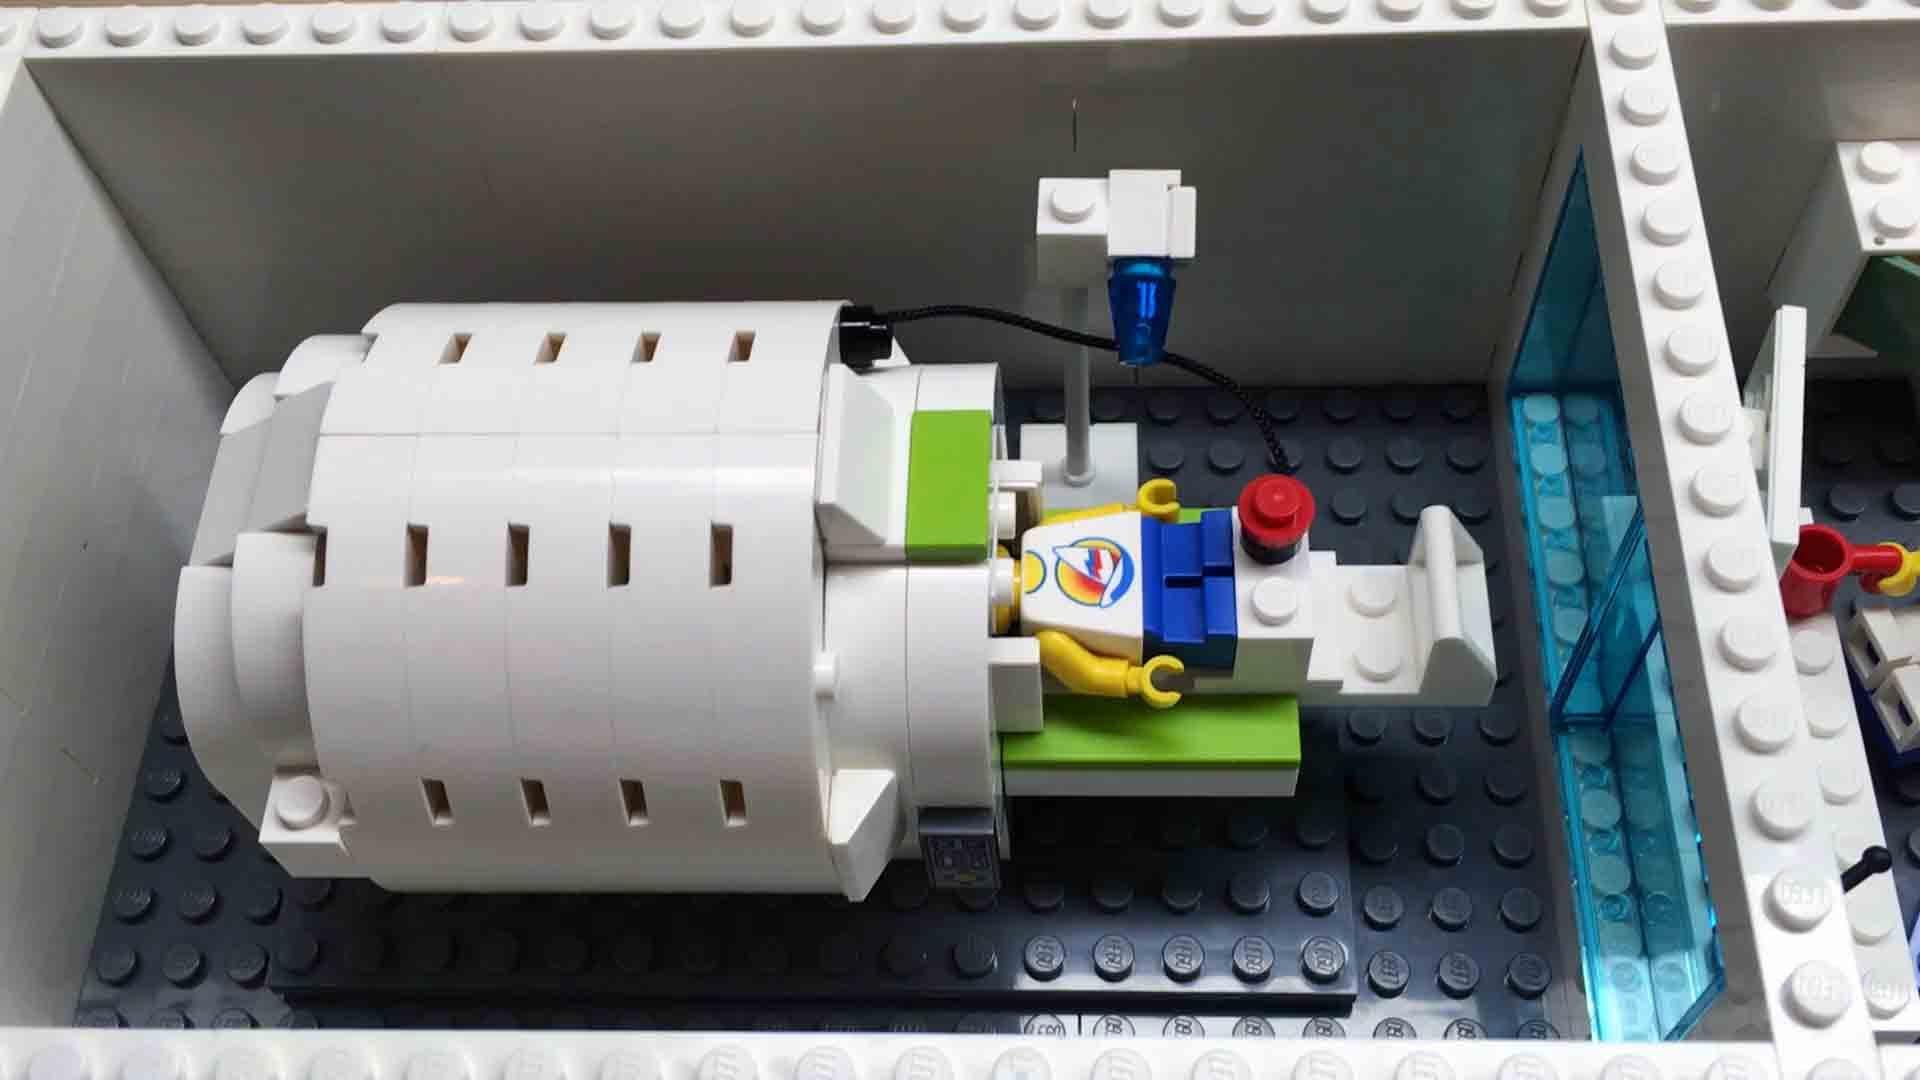 MRI - Lego Version - How many Teslas?